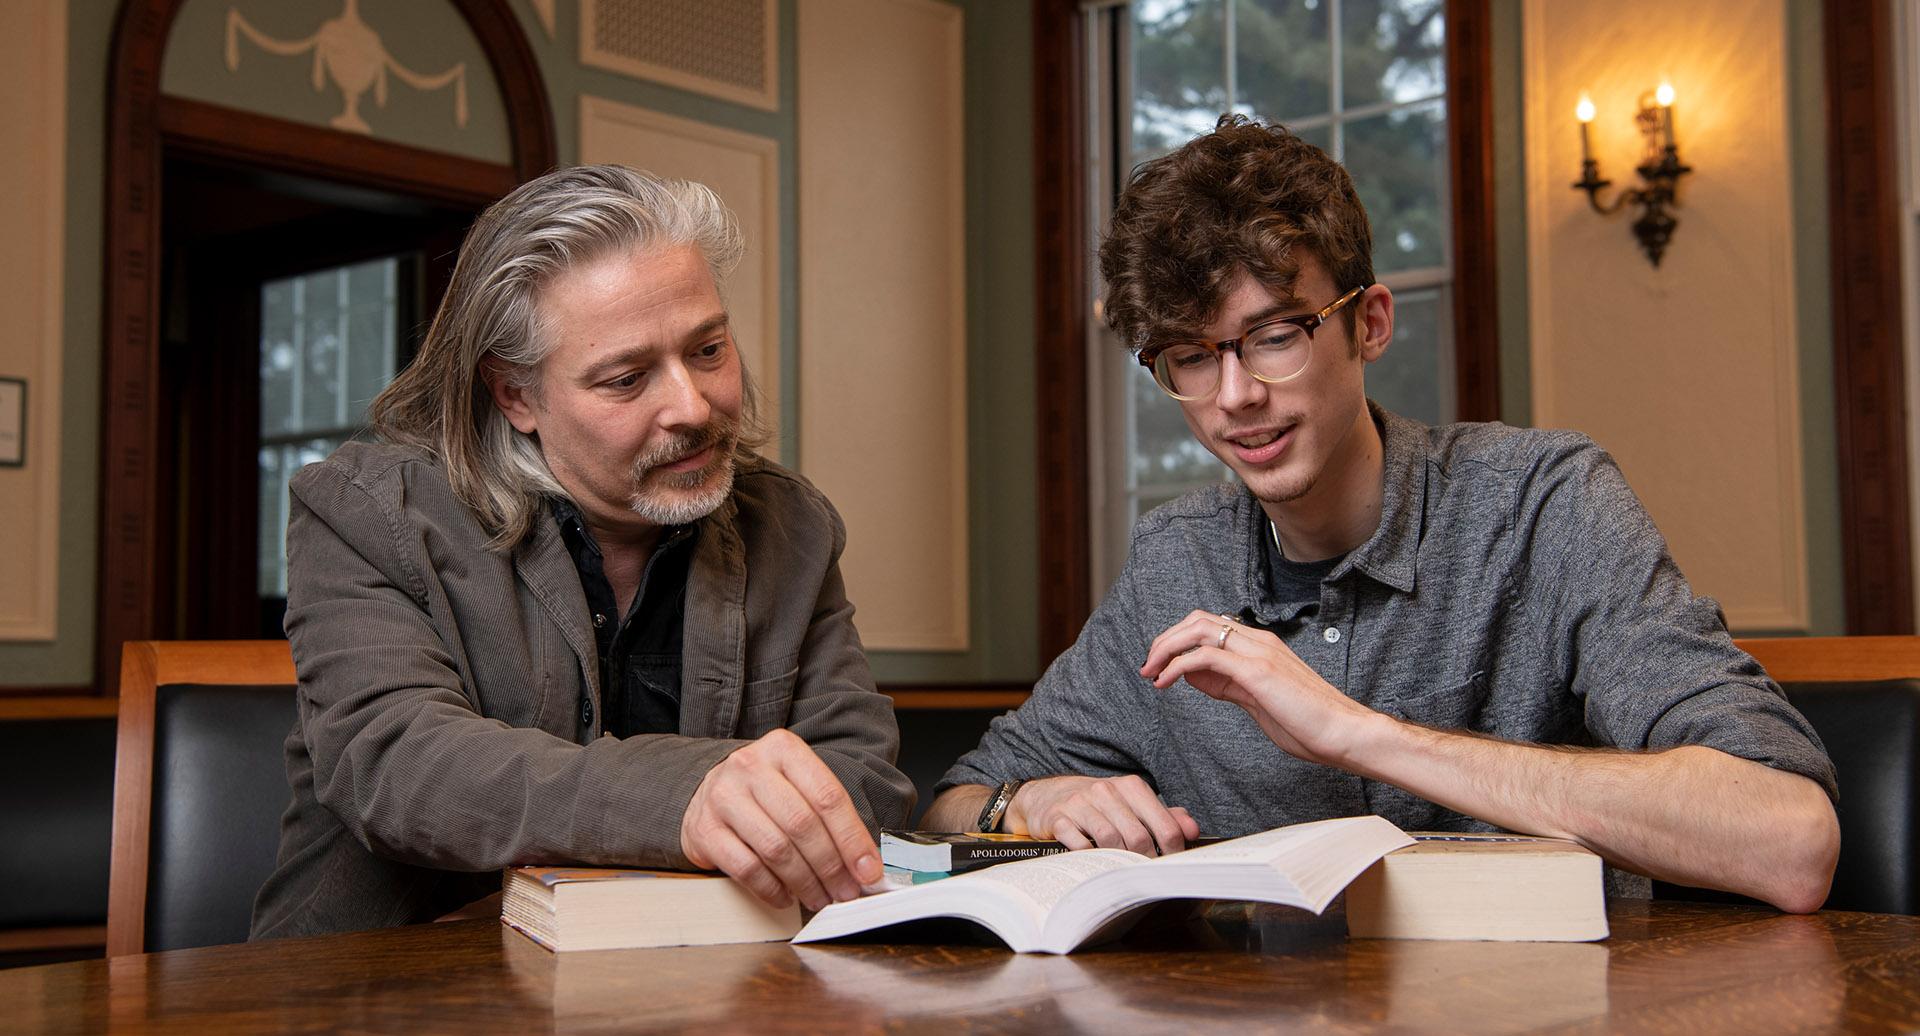 Keenan Dunleavy with Stephen Trzaskoma, professor of classics